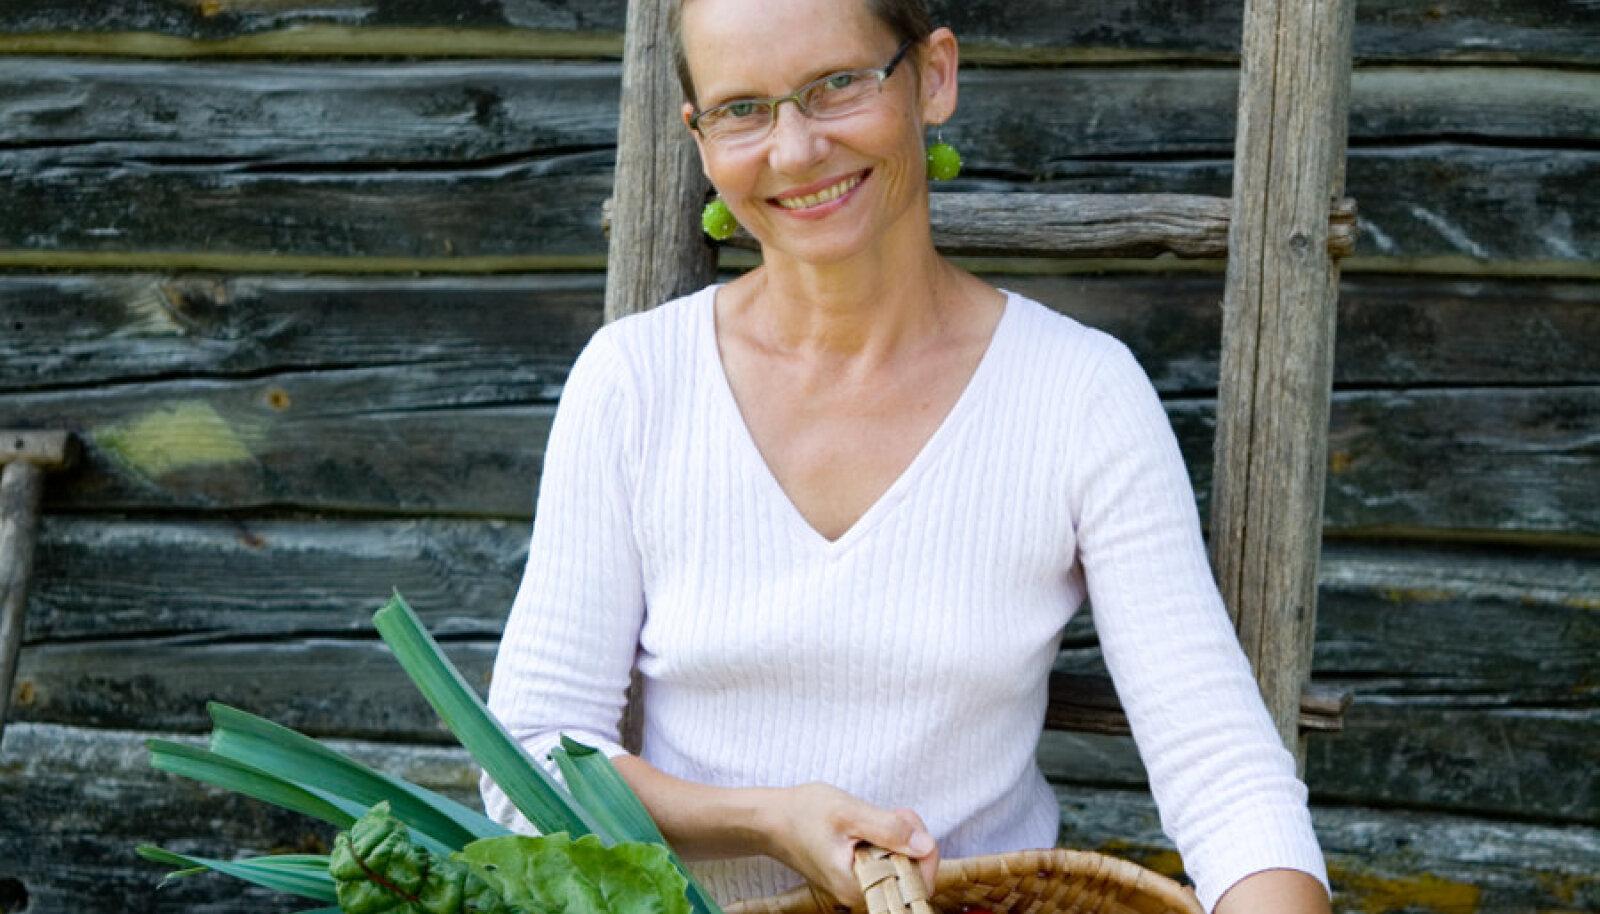 Marika Blossfeldt